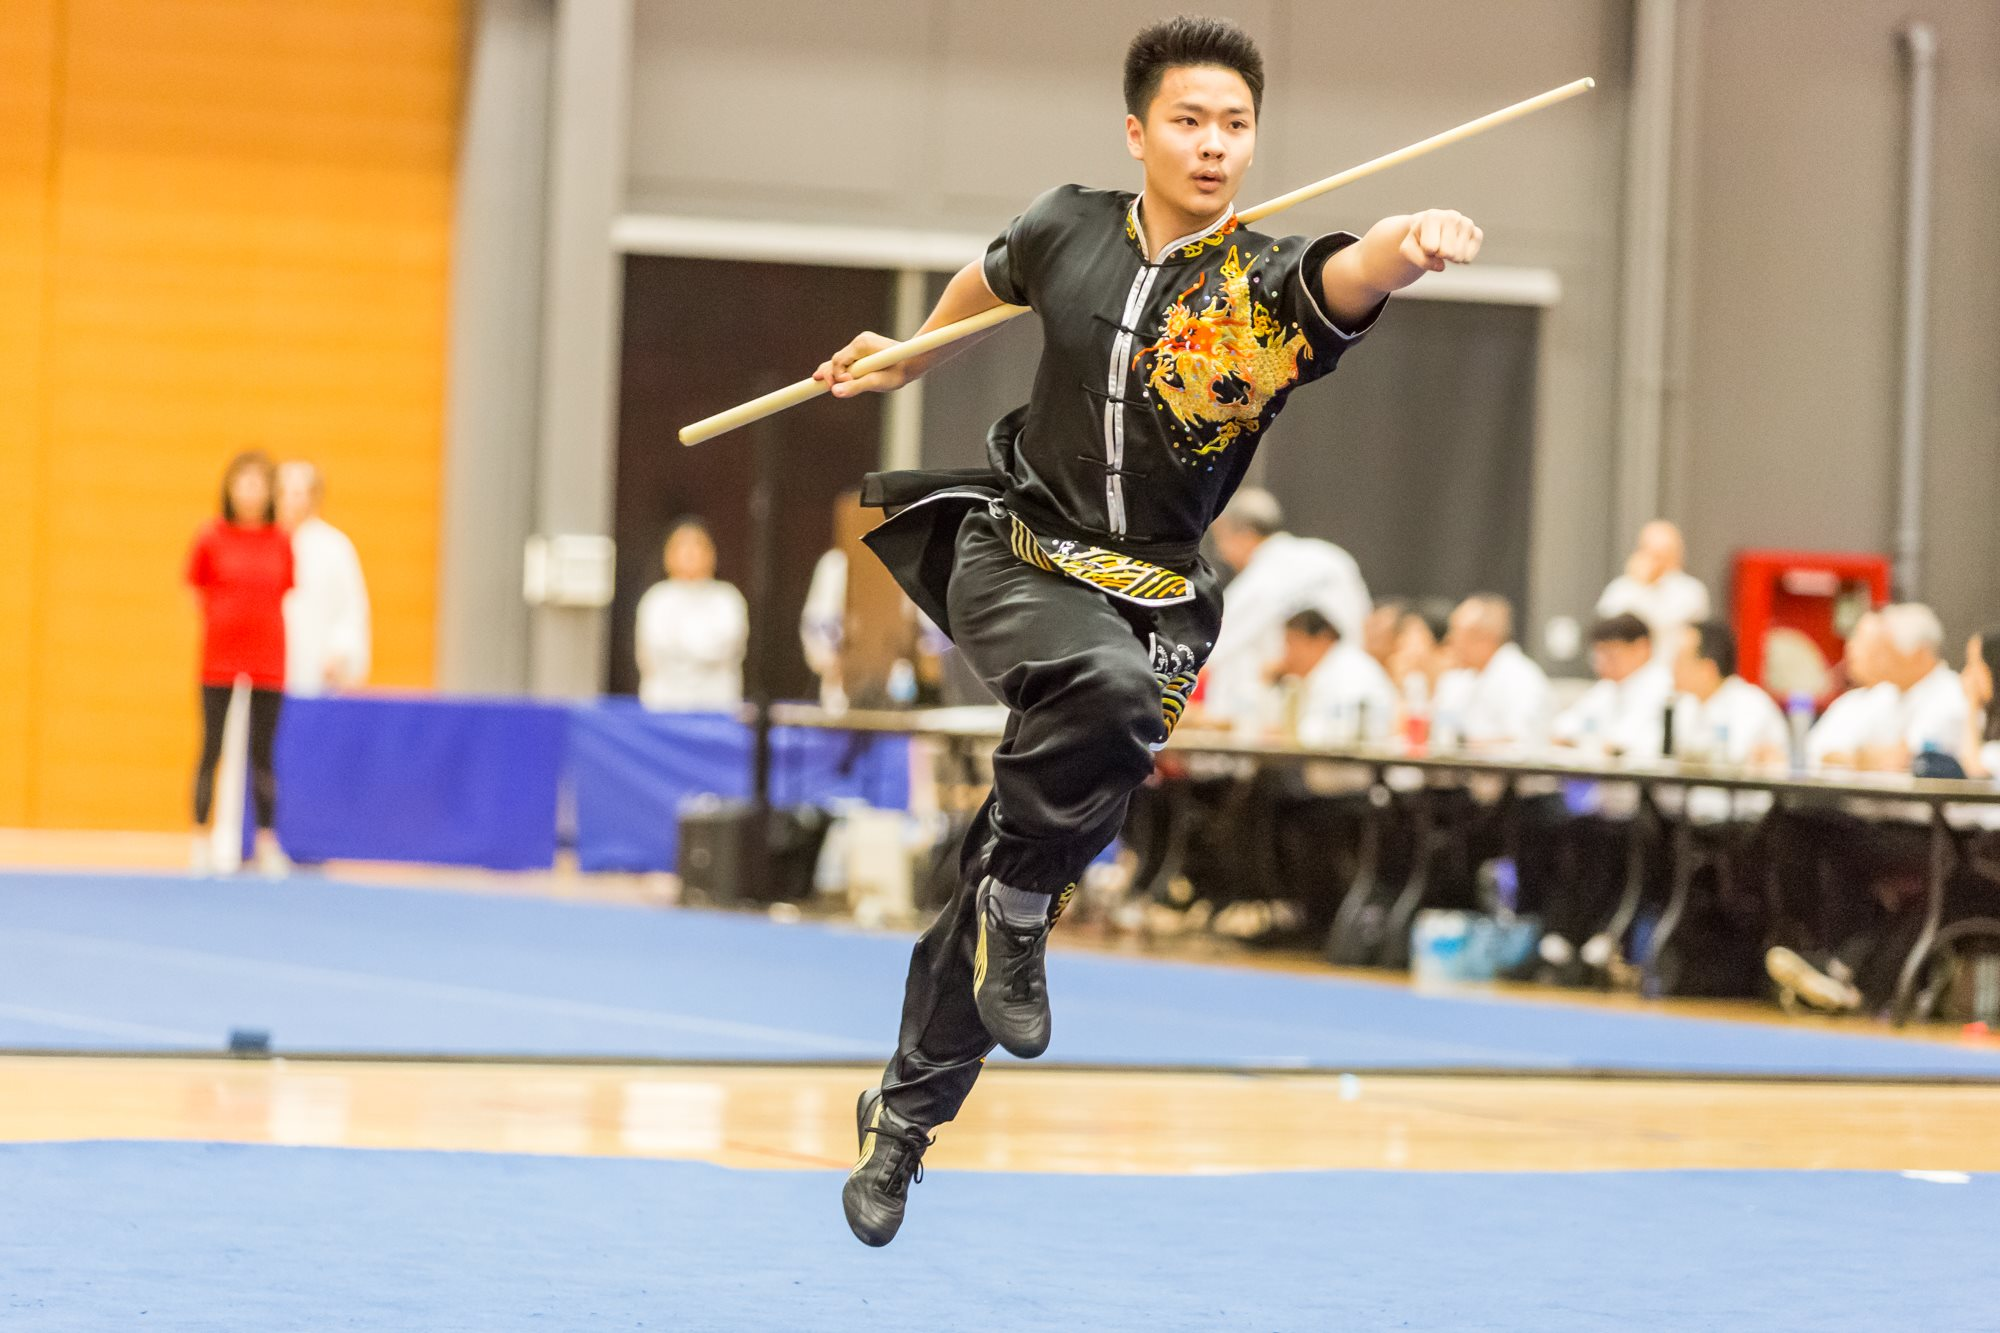 wayland-li-wushu-toronto-markham-canadian-wushu-championships-2017-gunshu-4.jpg